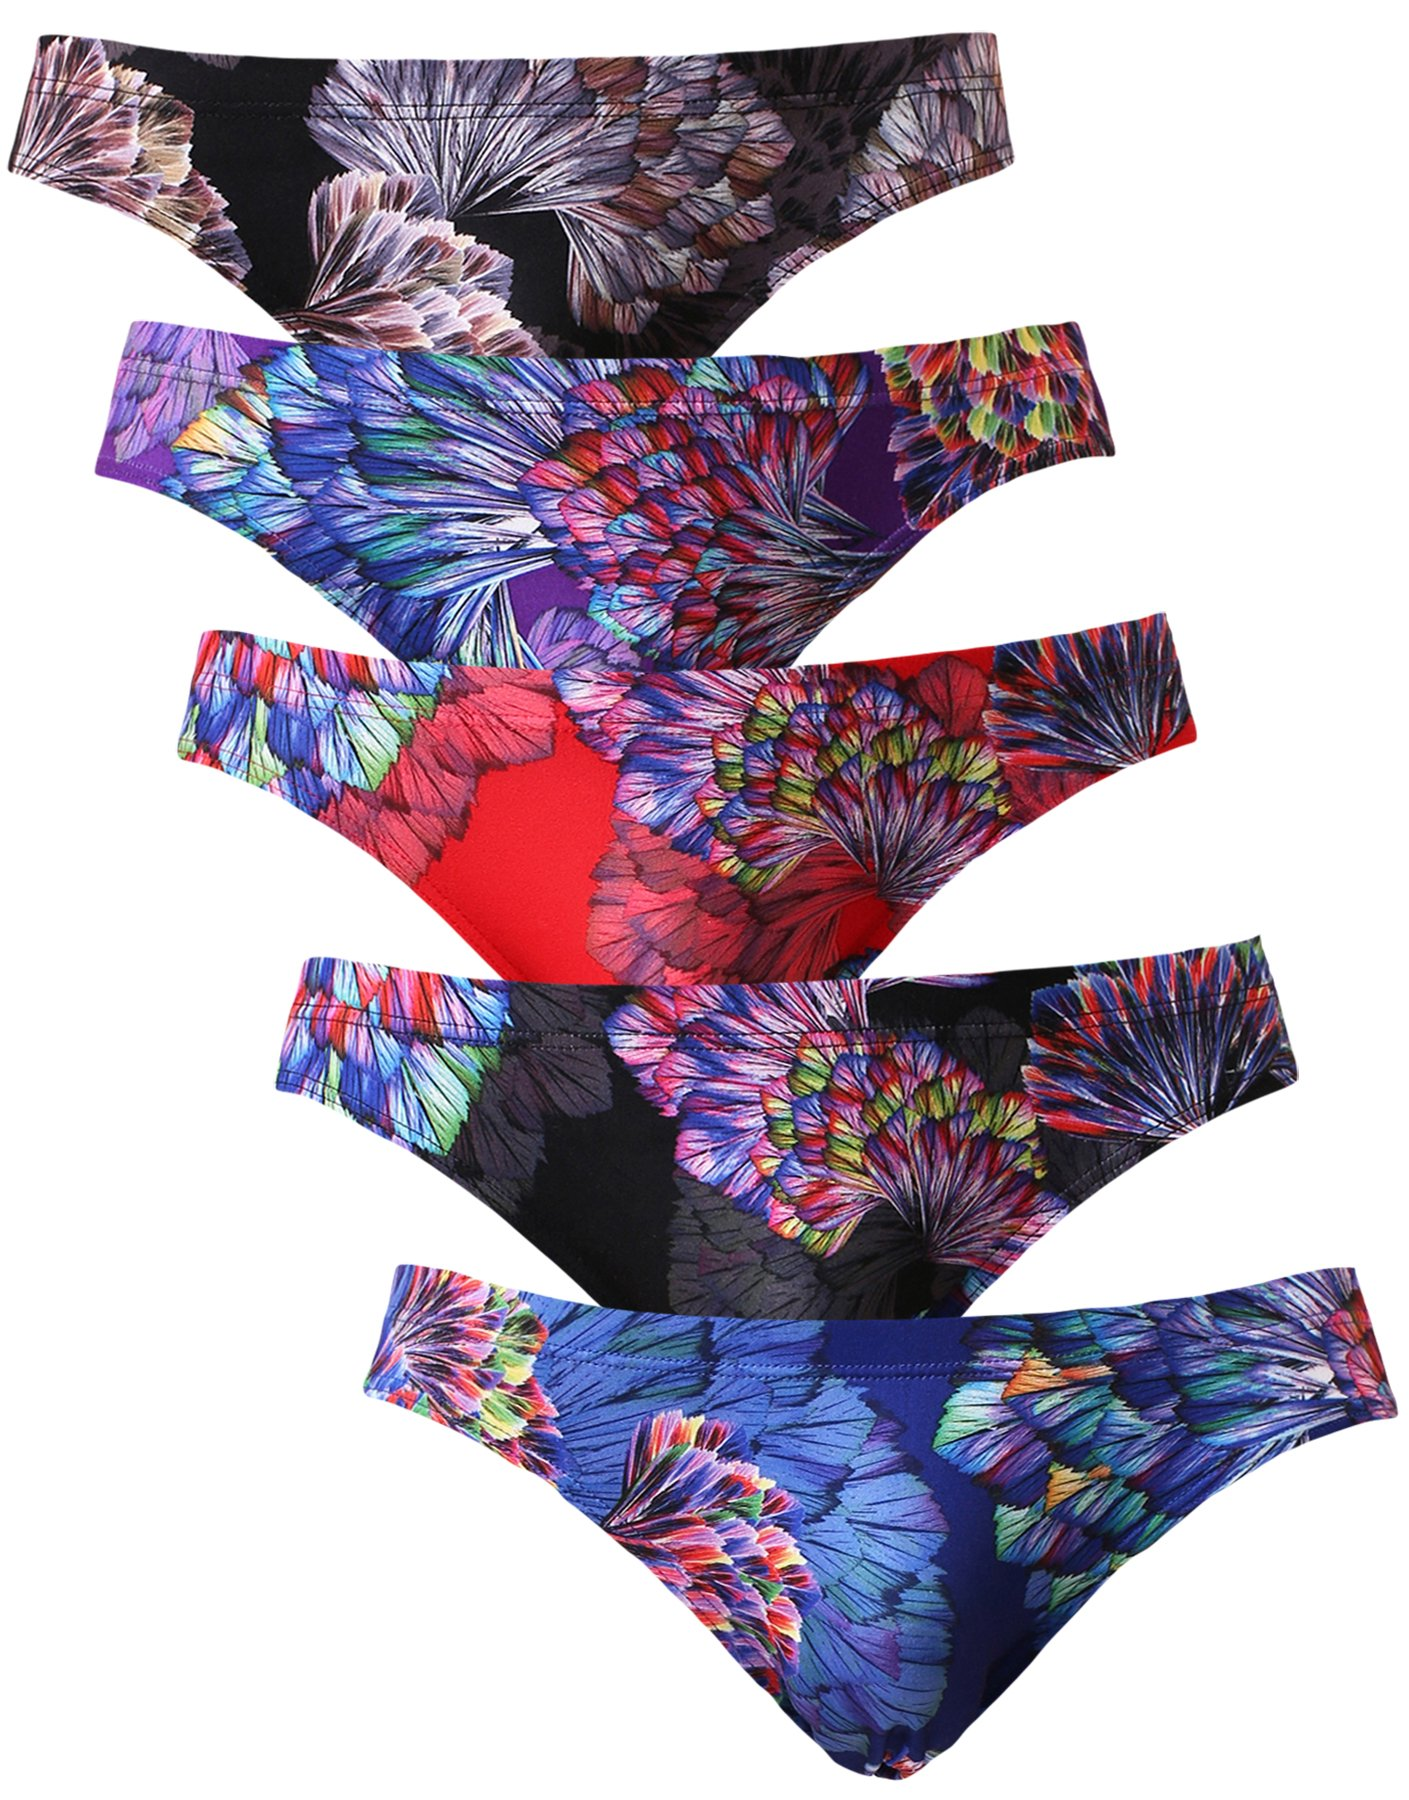 NEIKU Men's Sexy Ice Silk Bikini Underwear Low Rise Seamless Breathable Briefs 5 Pack L